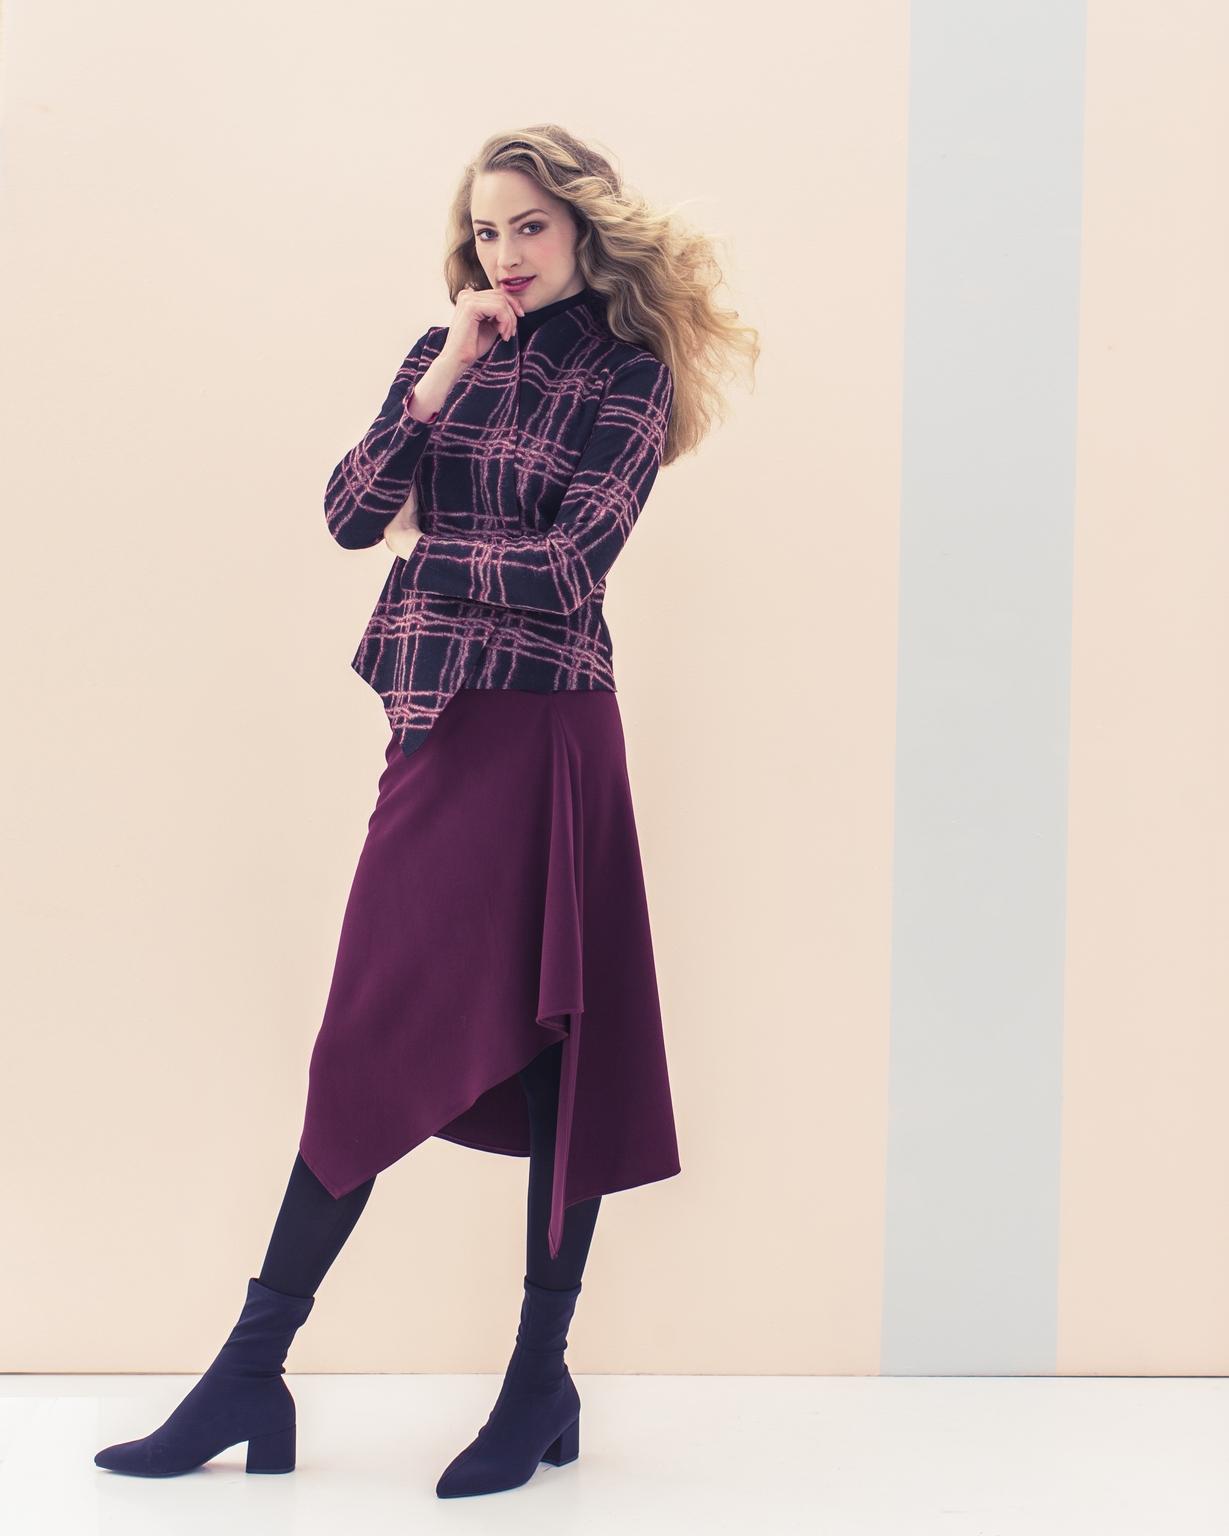 Les Magazines De Novembre 2017 Fashion Style 17 Bonus